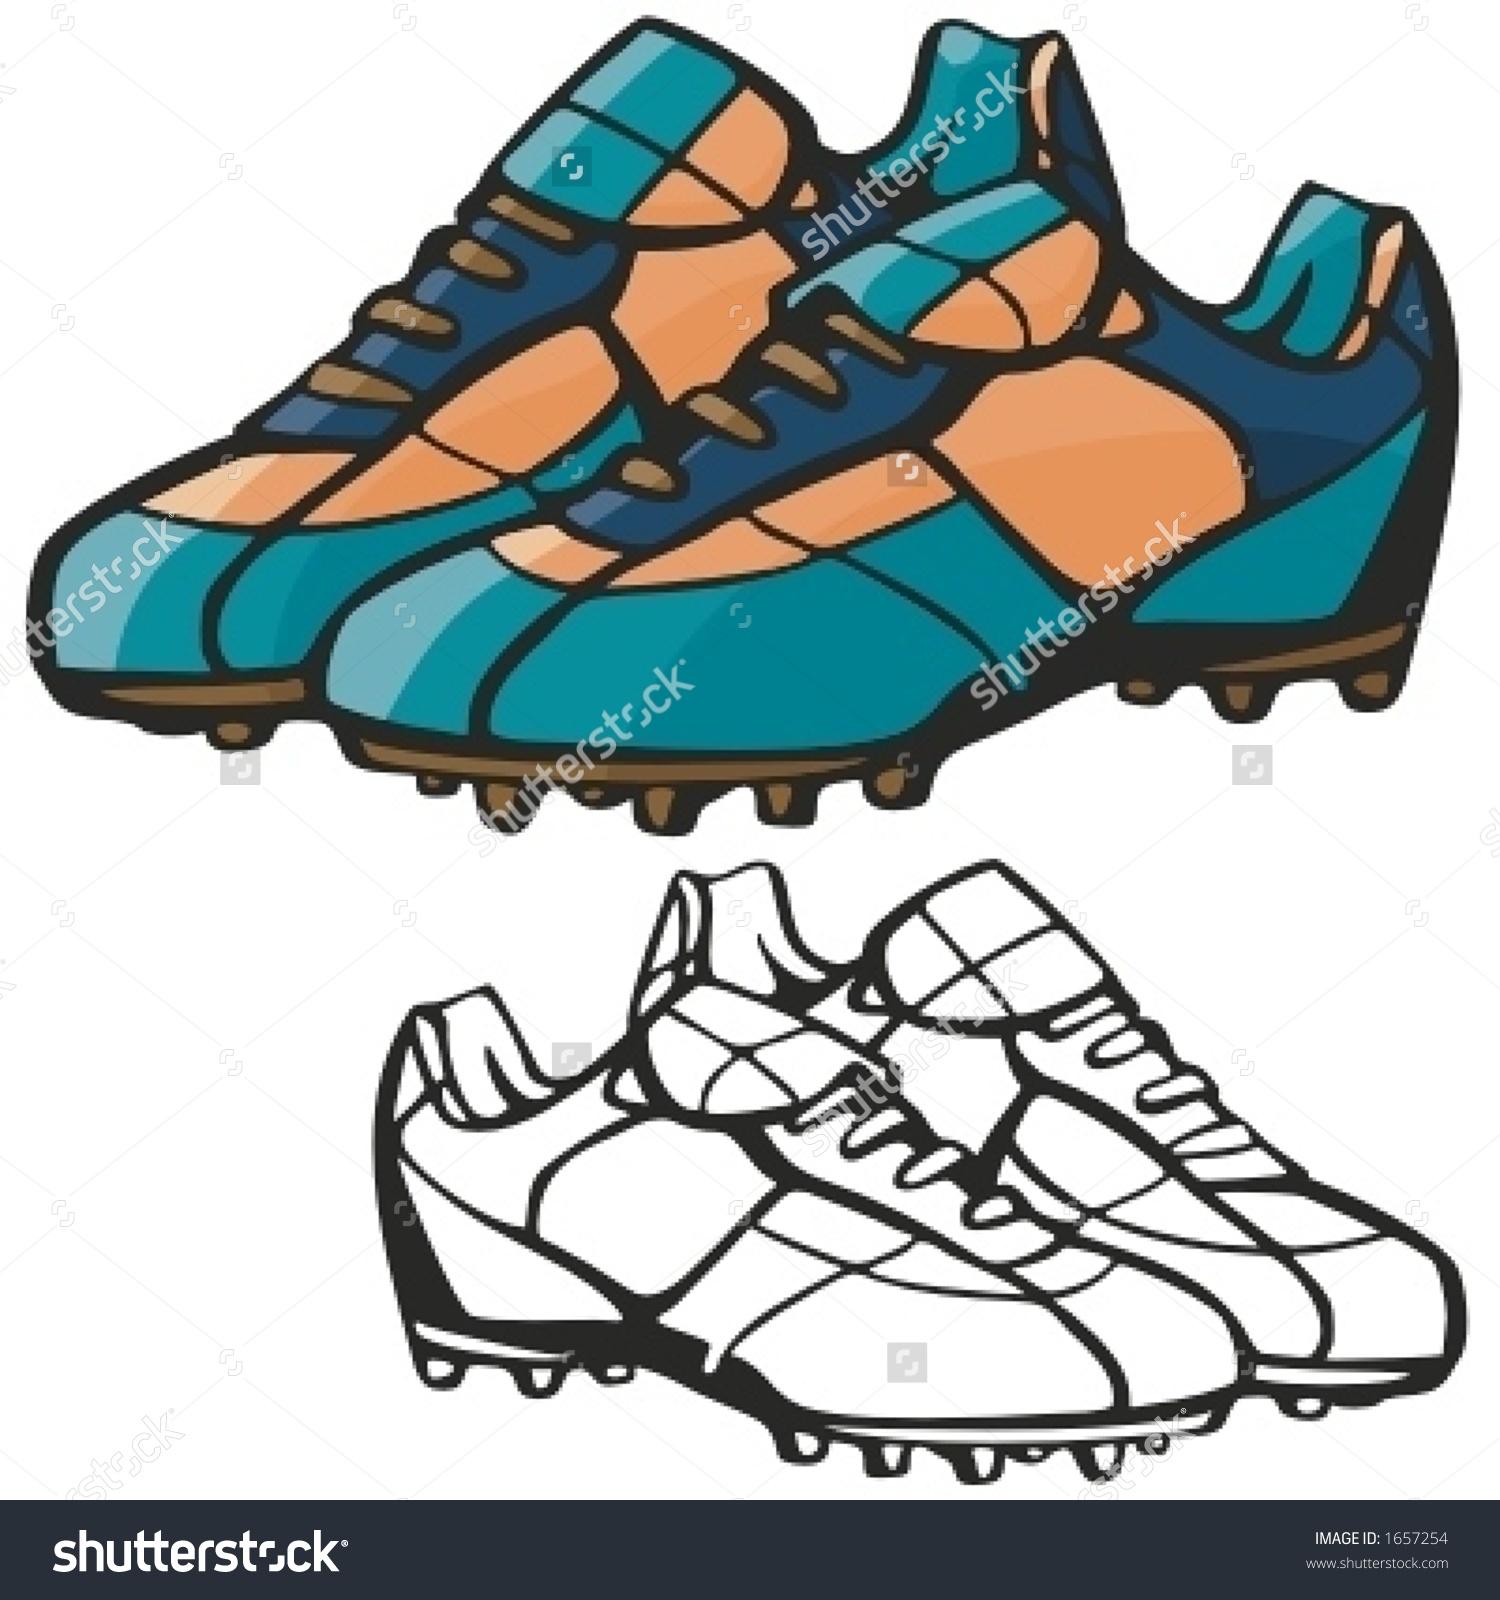 Football boots clipart #7